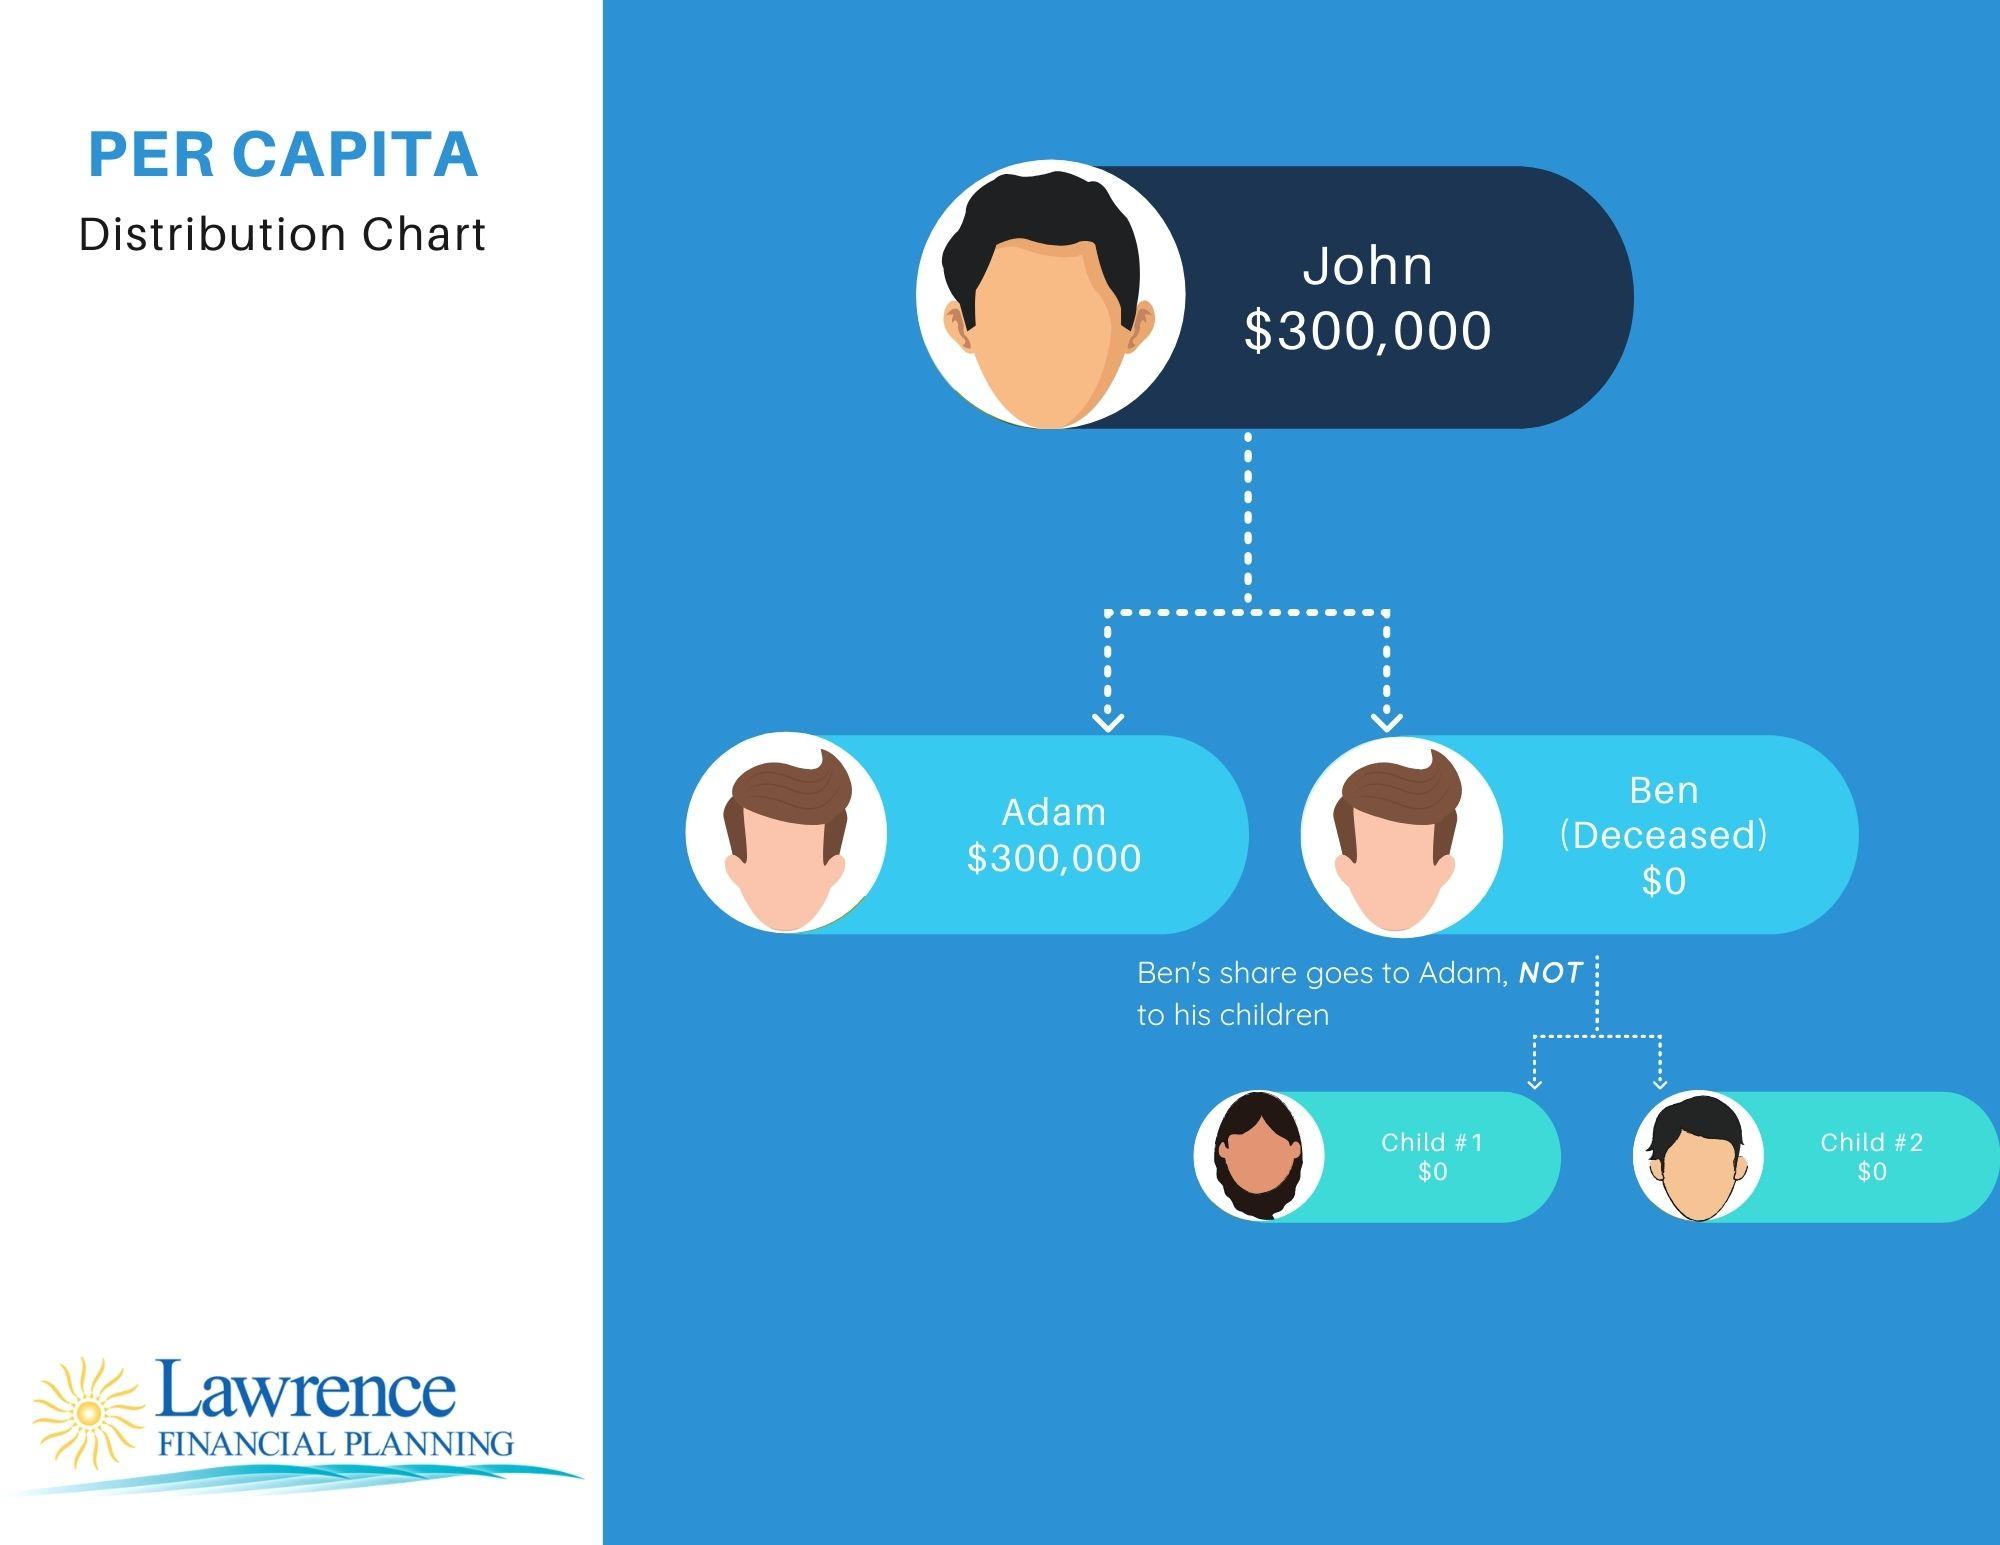 per capita distribution